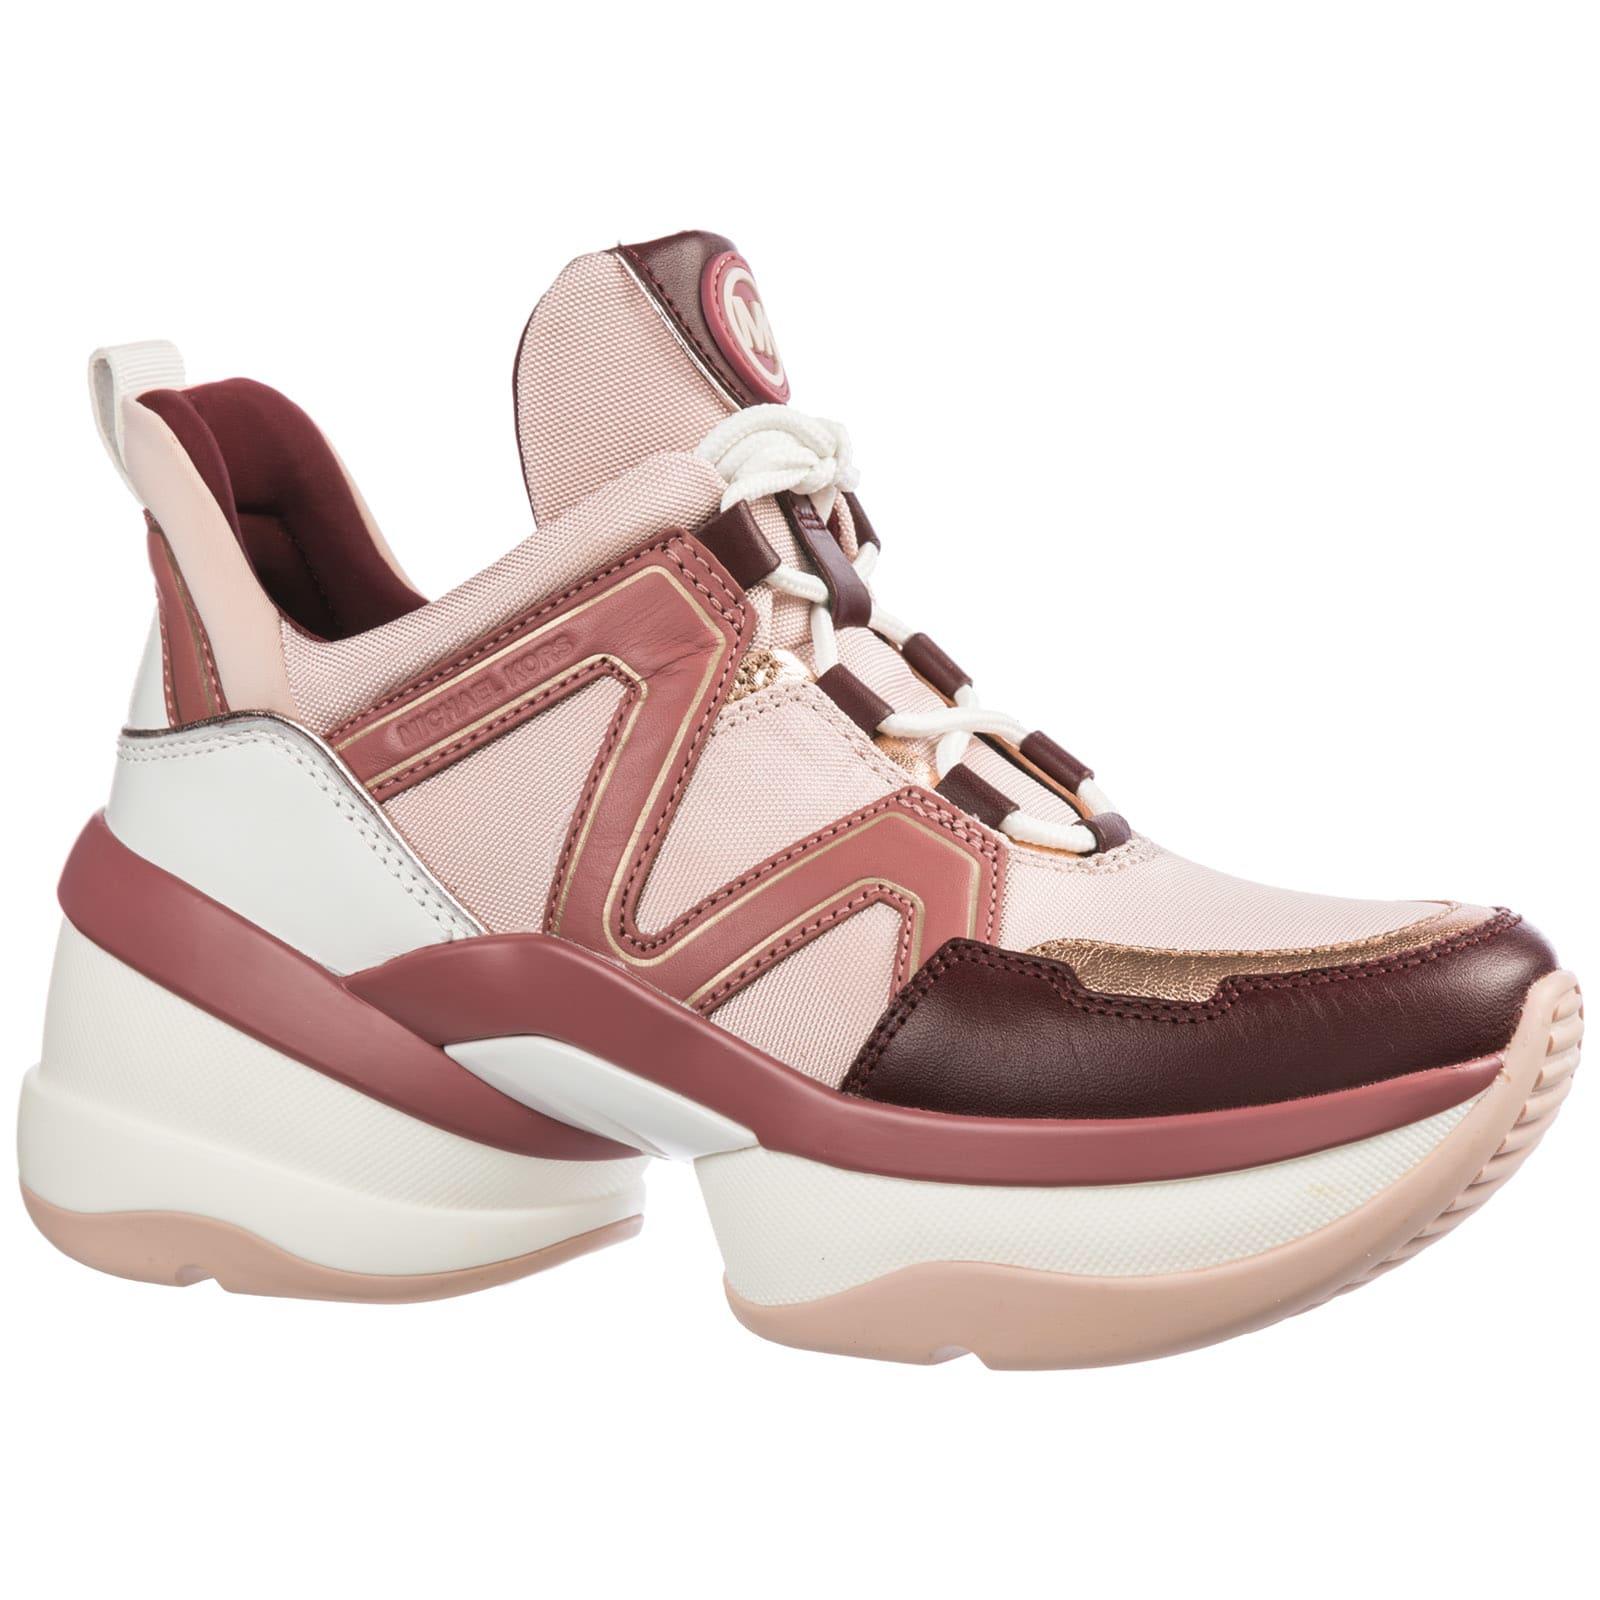 Black MICHAEL KORS Sneakers GEORGIE TRAINER - Omoda.com